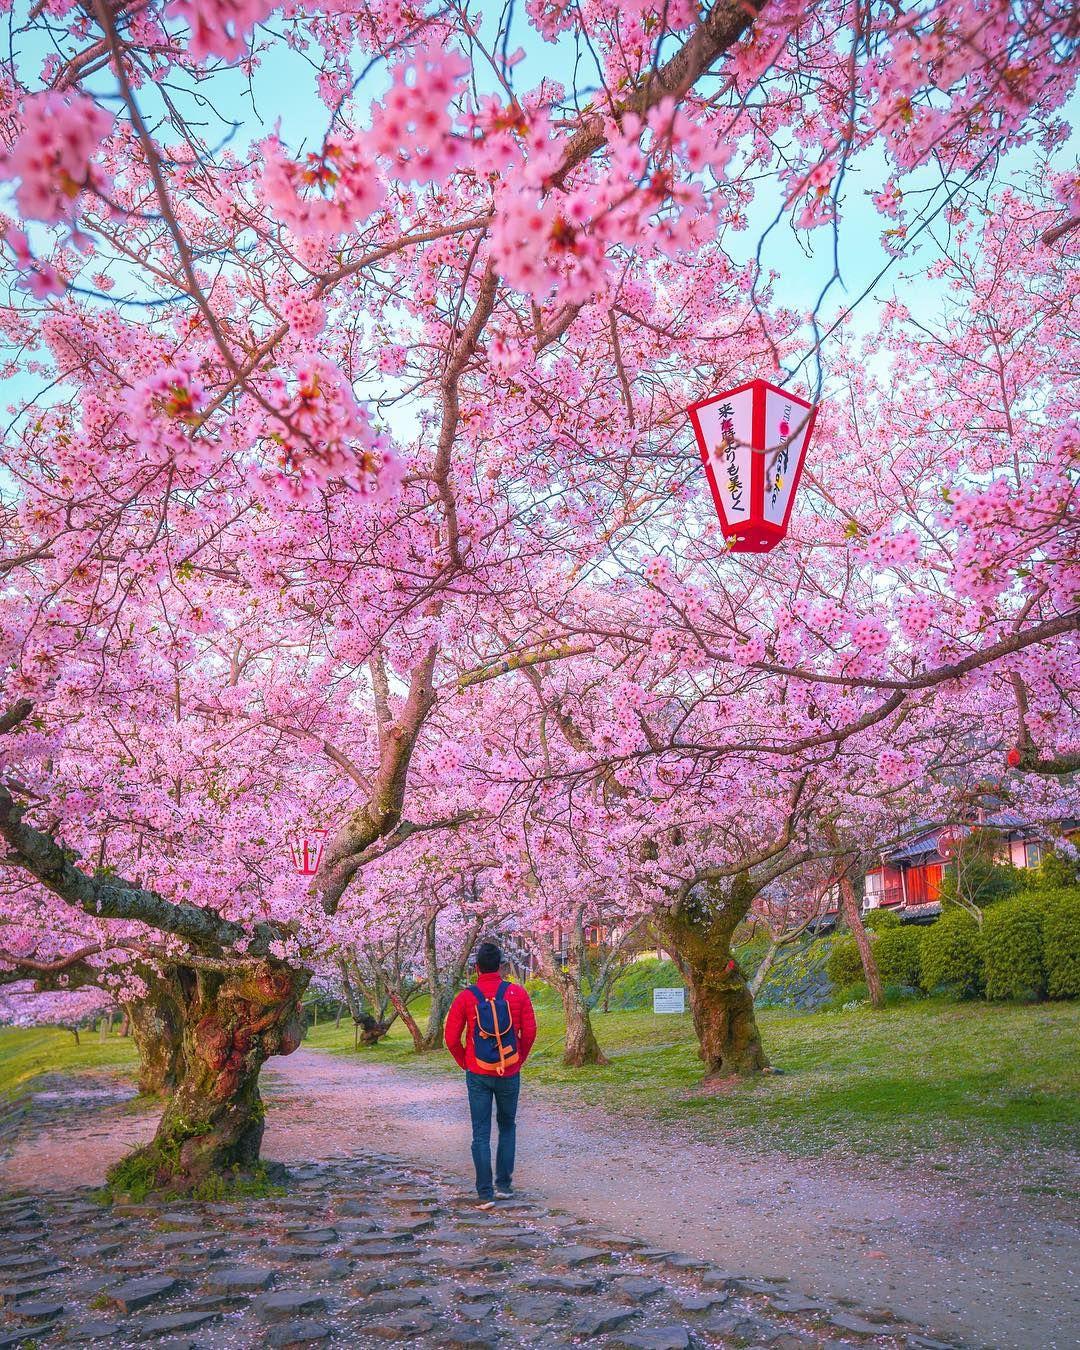 Japanese Cherry Blossom Cherry Blossom Japan Cherry Blossom Nature